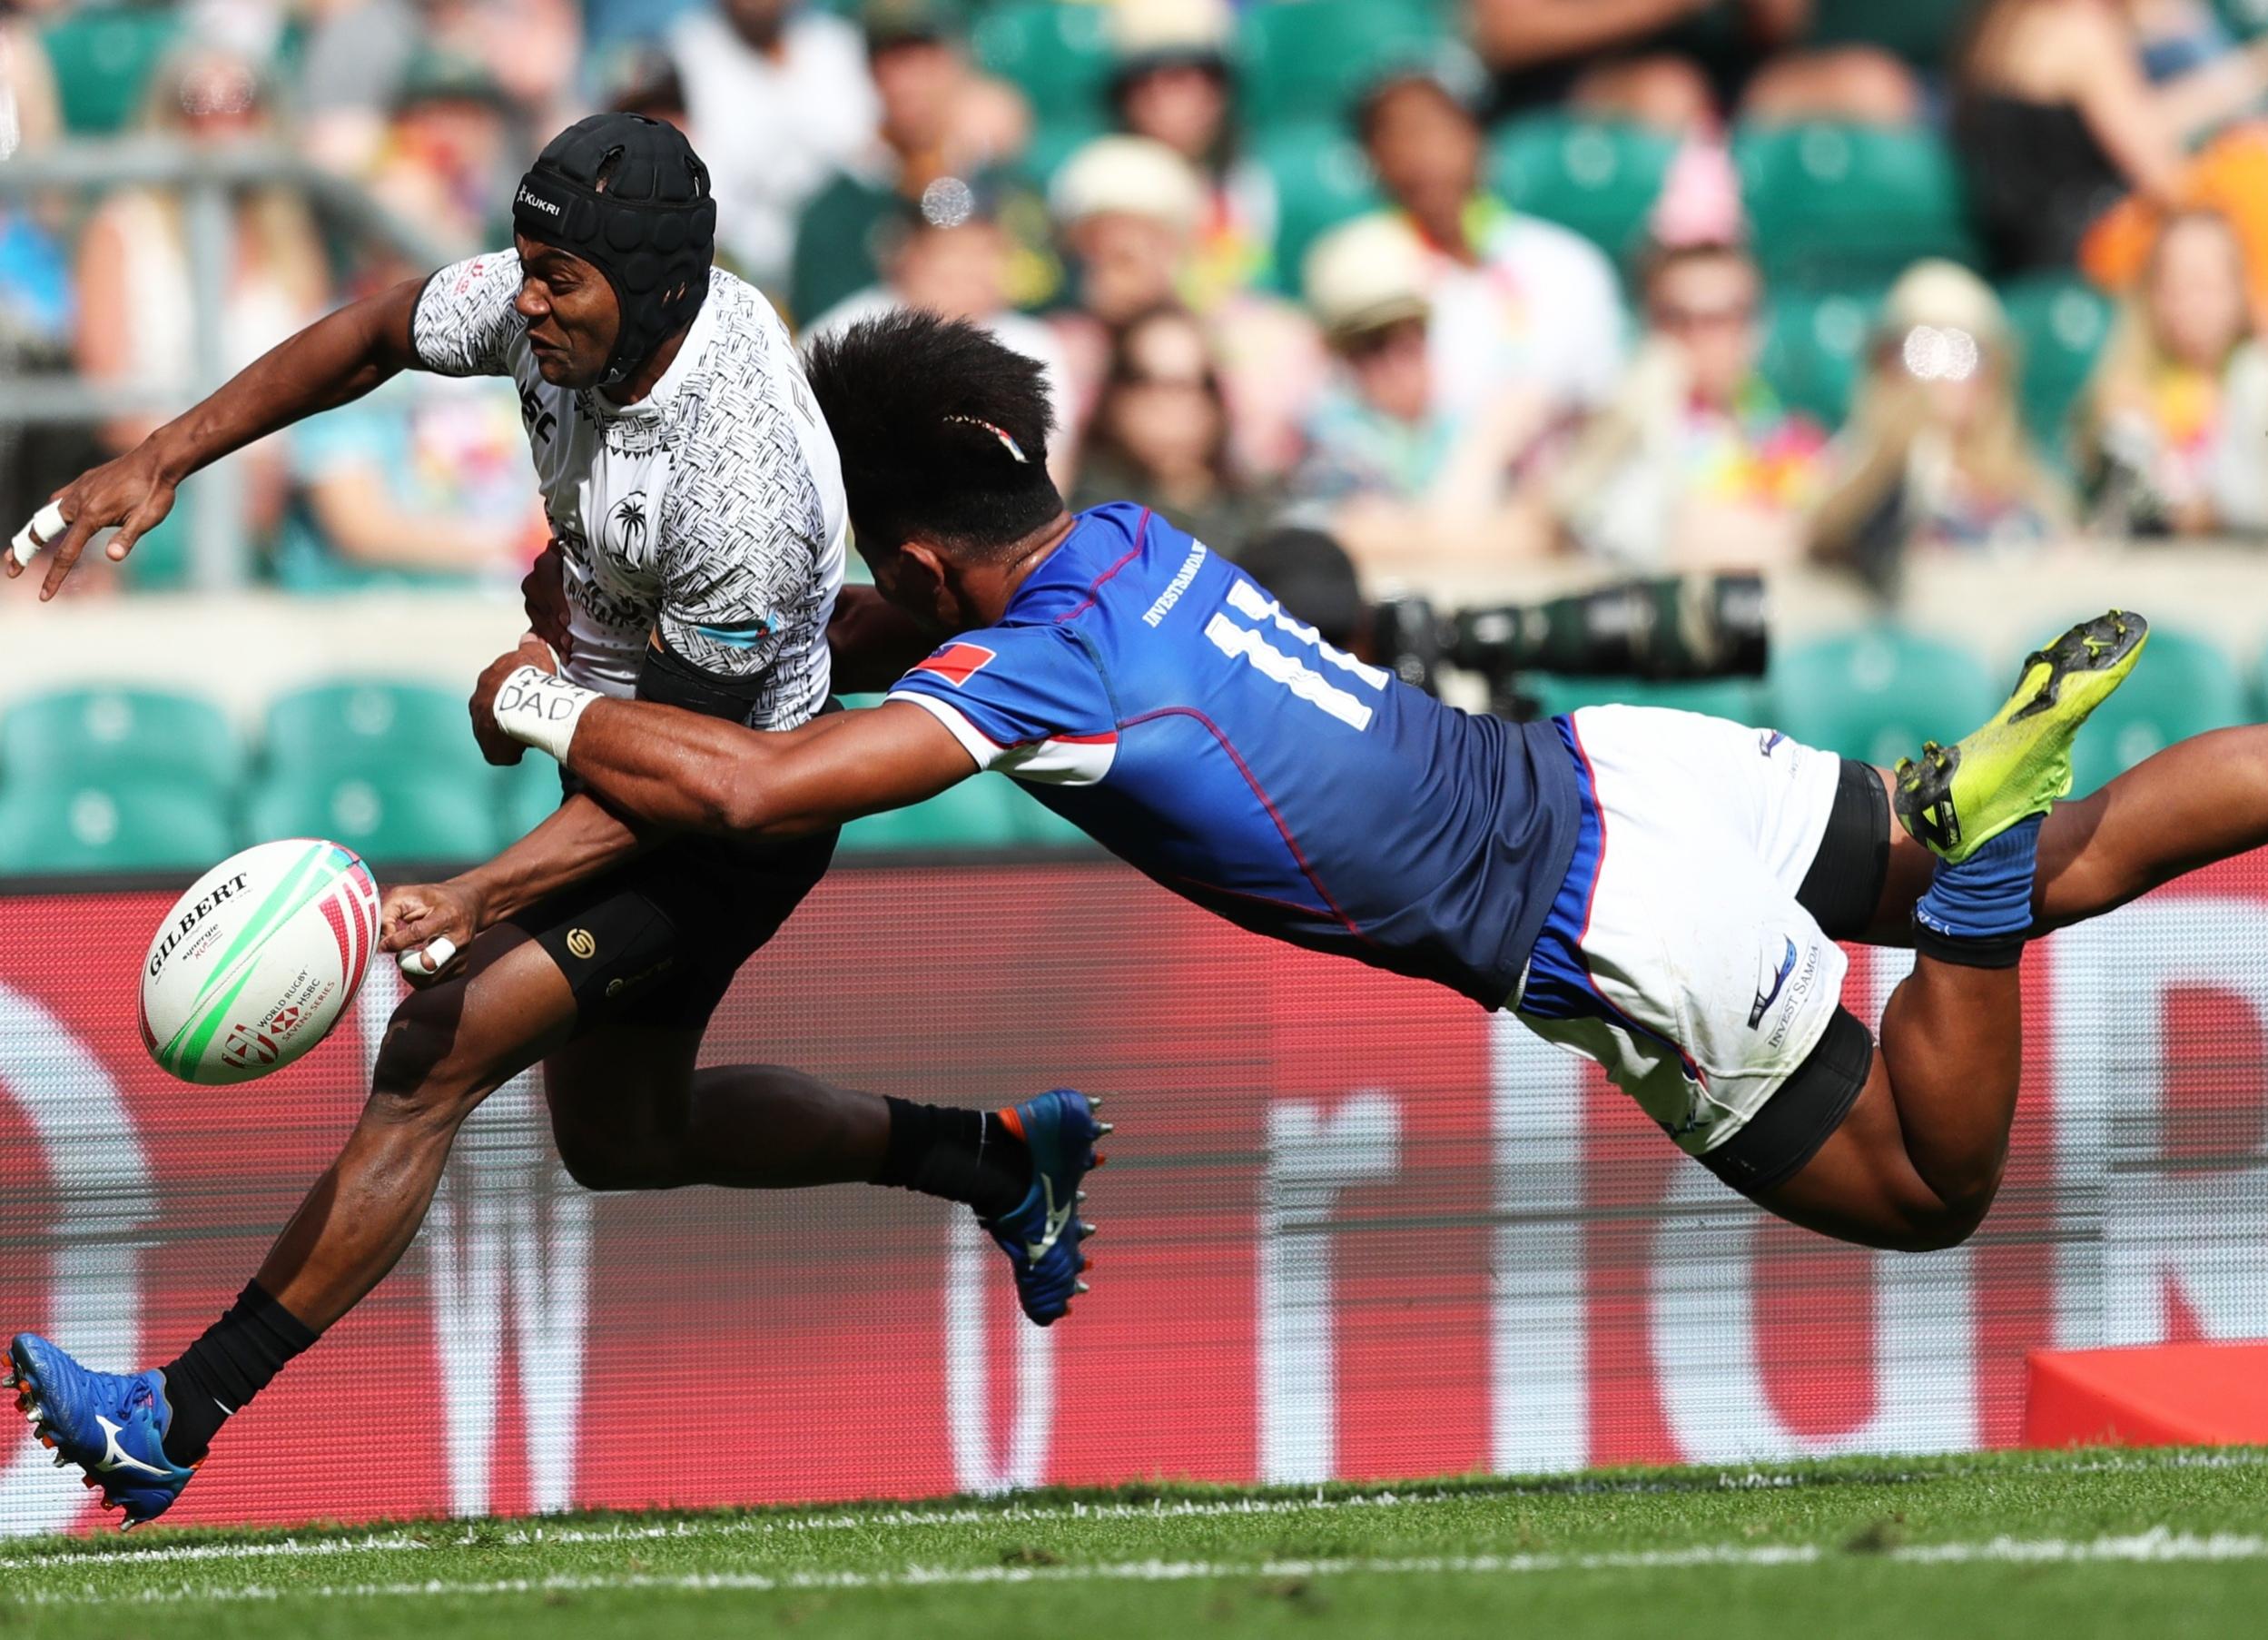 The Fiji Times » HSBC London 7s: Fiji in semi finals